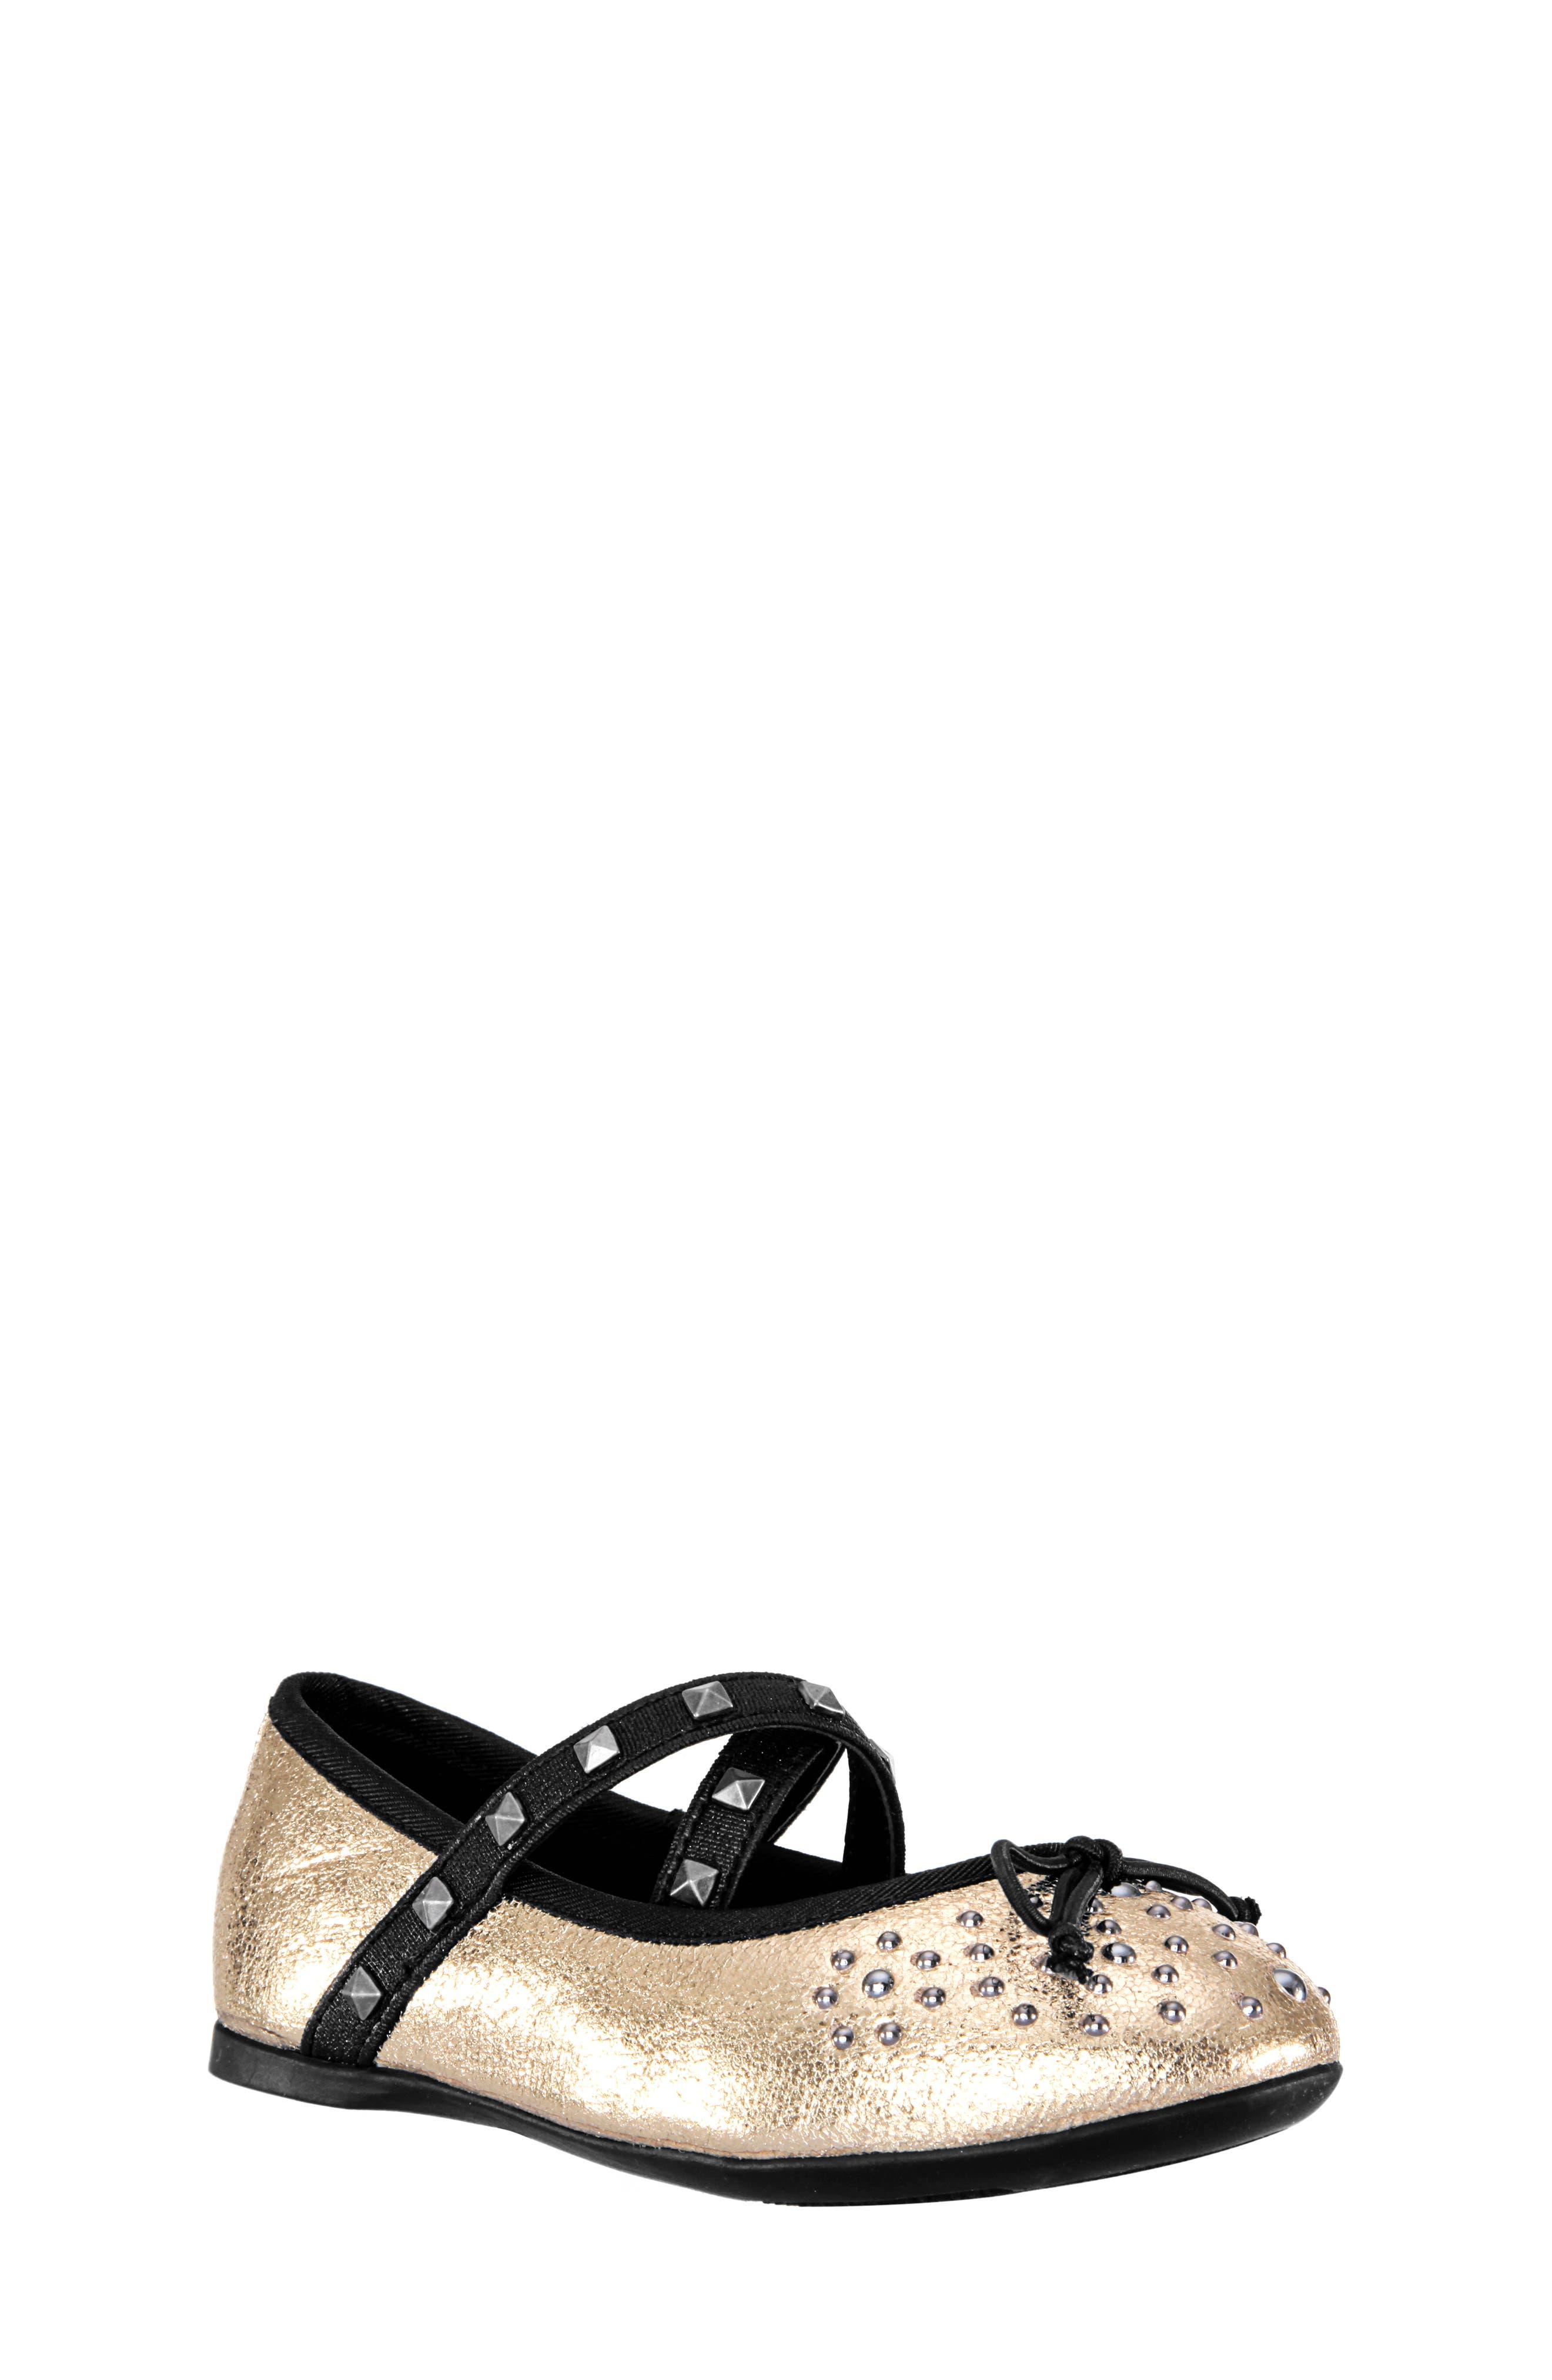 Averi Studded Ballet Flat,                             Main thumbnail 1, color,                             GOLD CRACKLE METALLIC